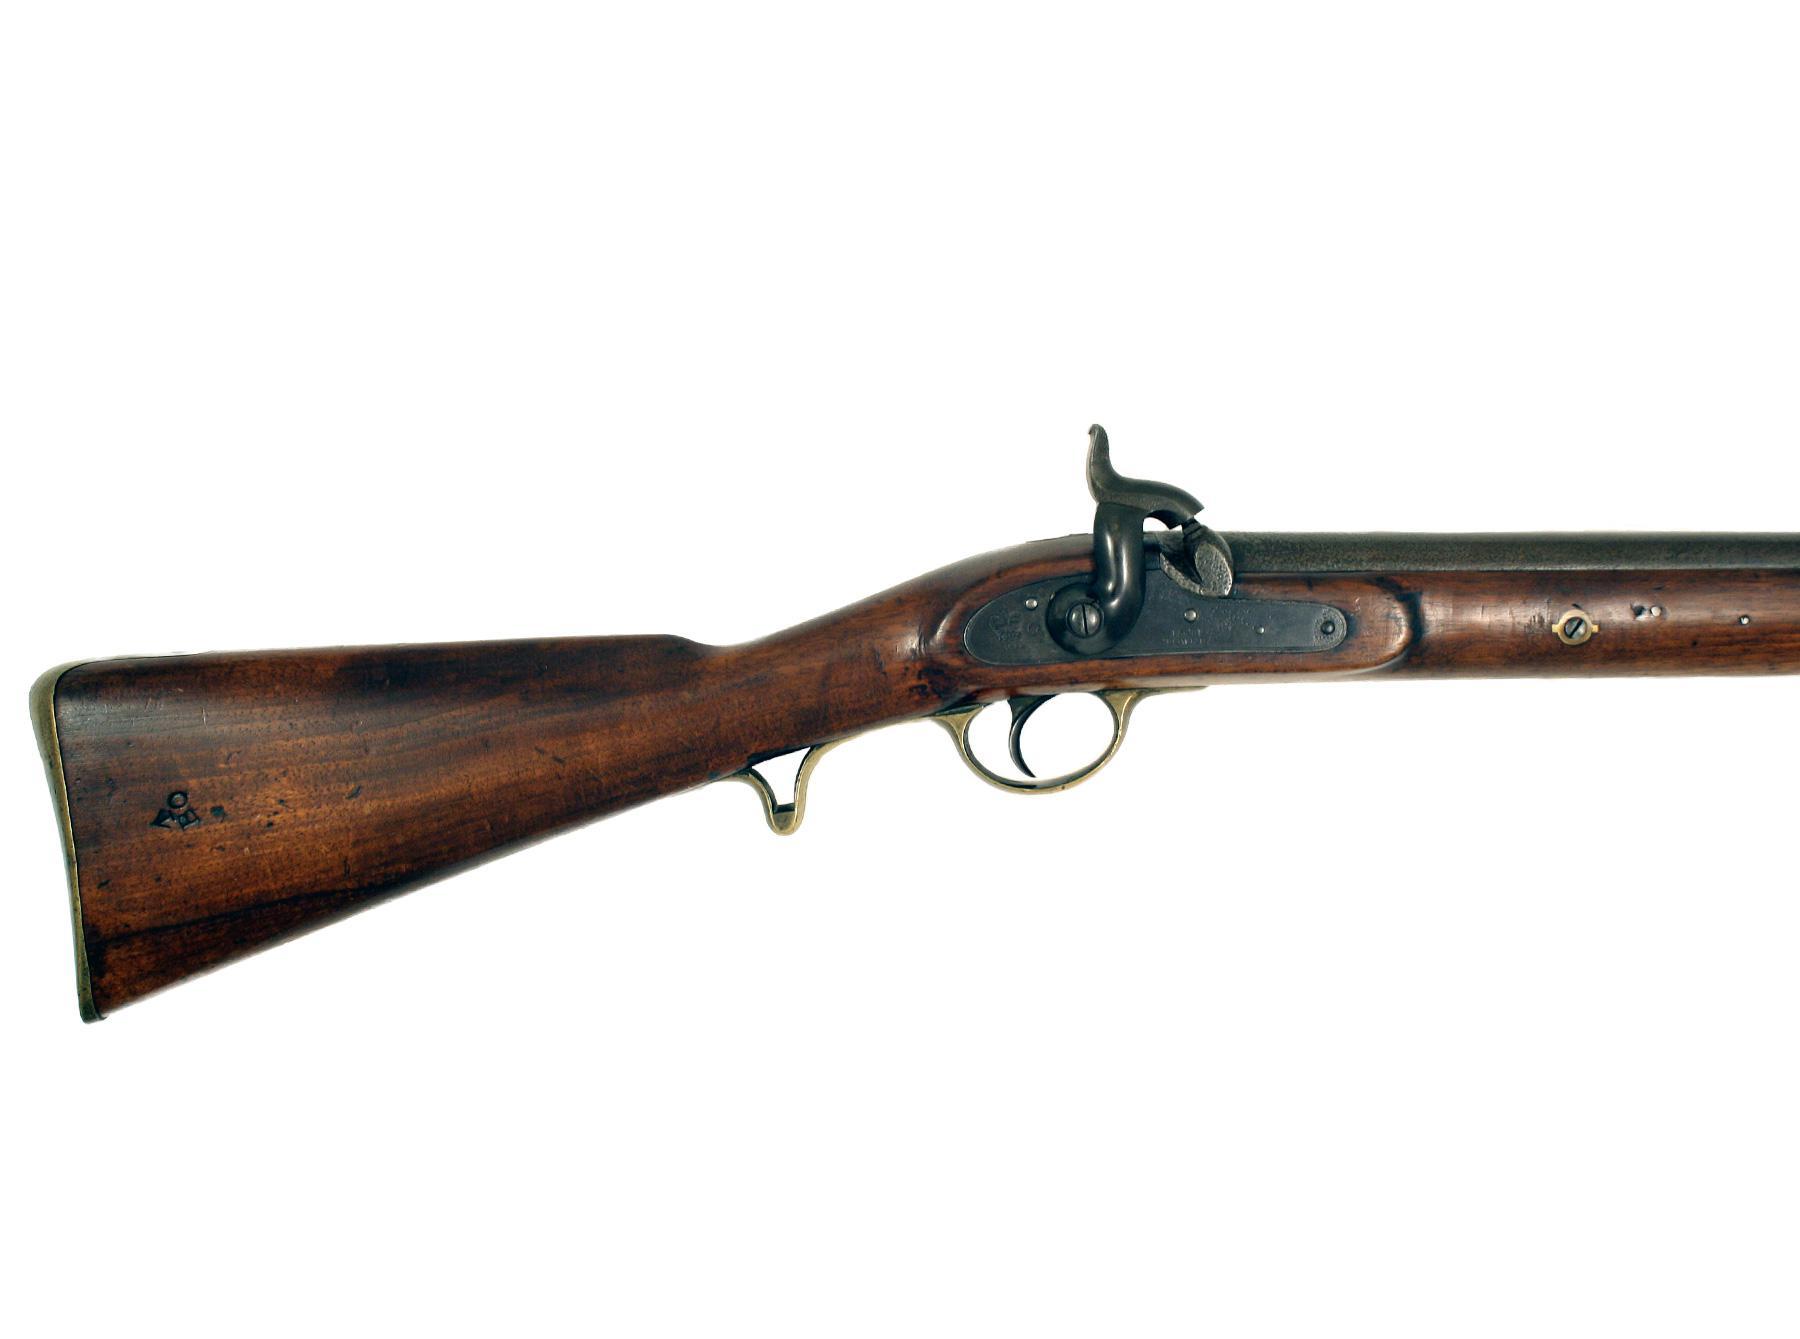 A Victoria Carbine